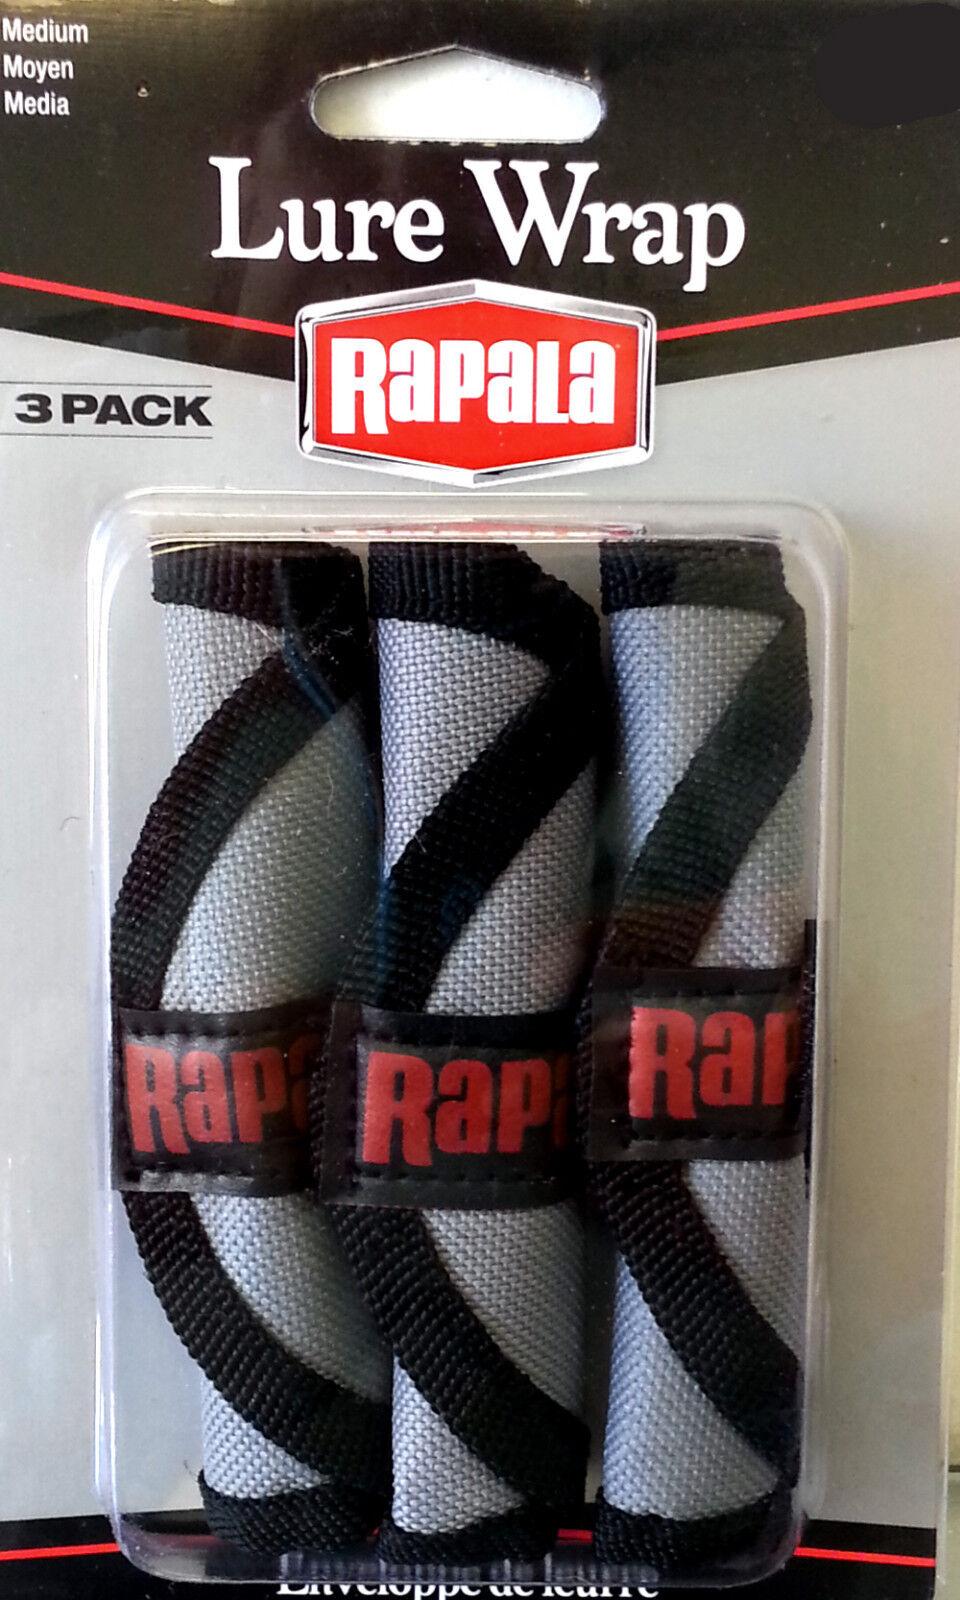 Rapala Lure Wrap Inhalt  3 Stück